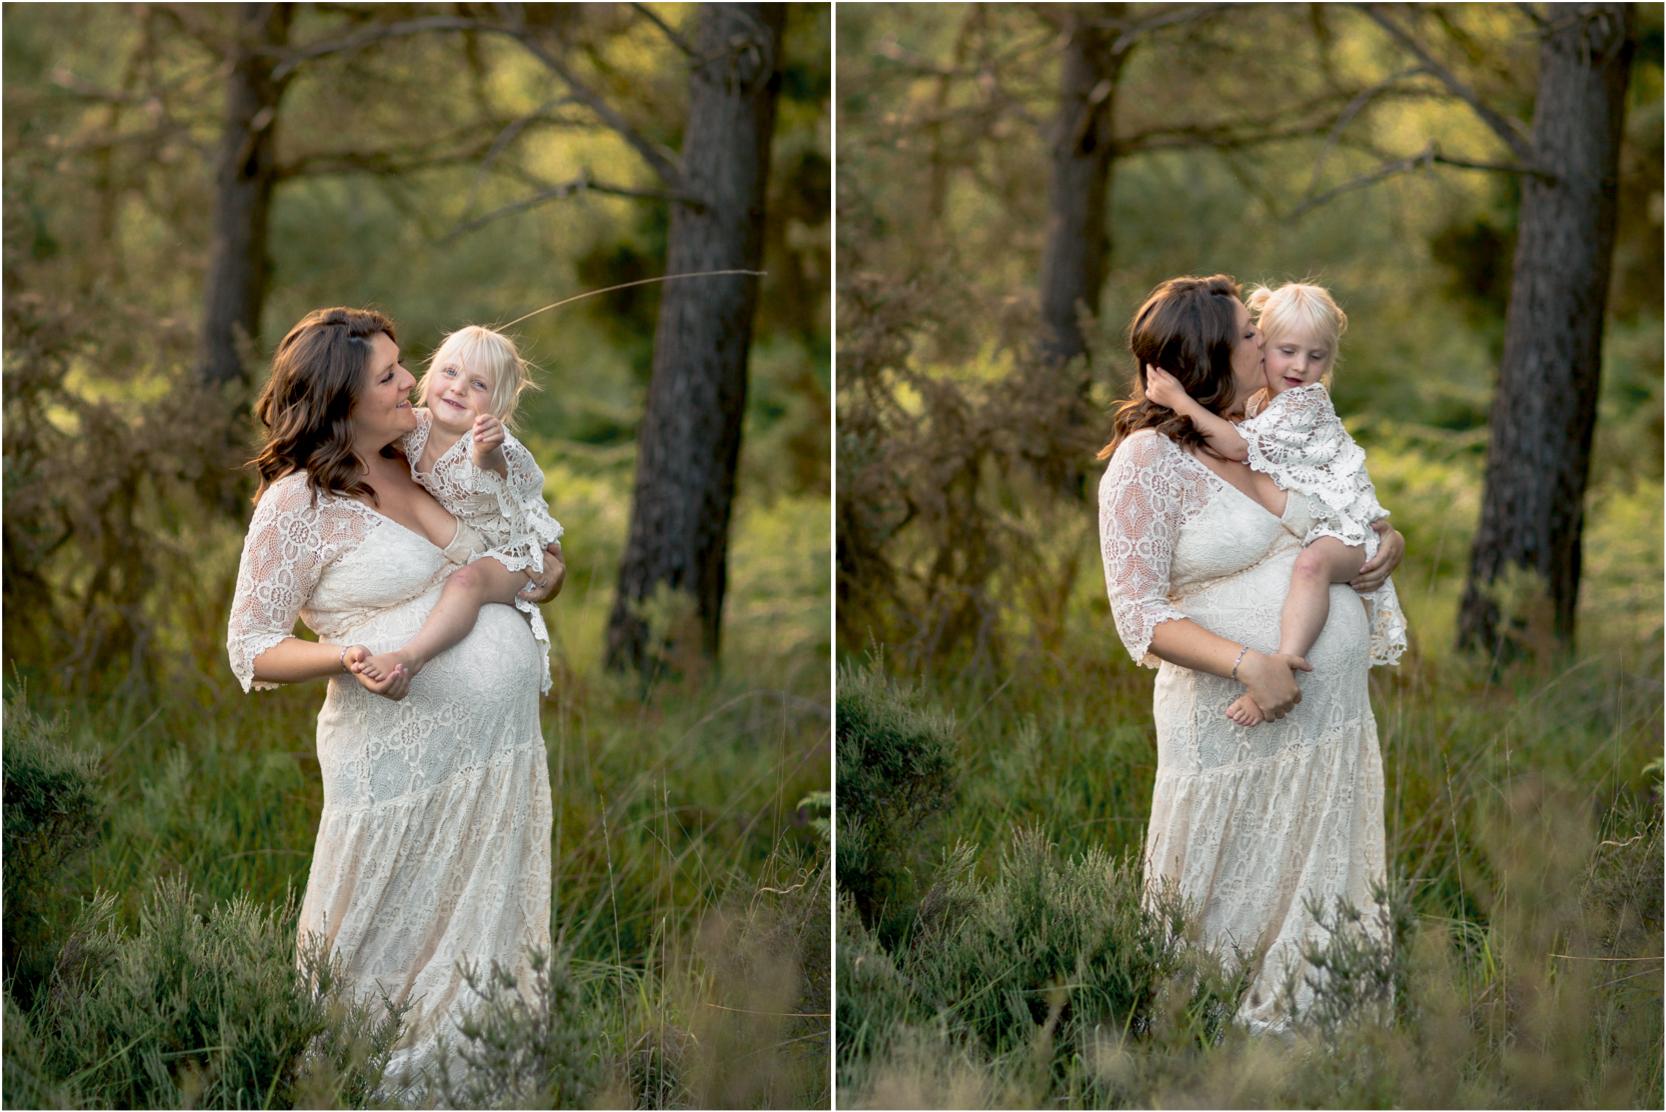 Rebecca Searle Photography Maternity Photography 13.jpg